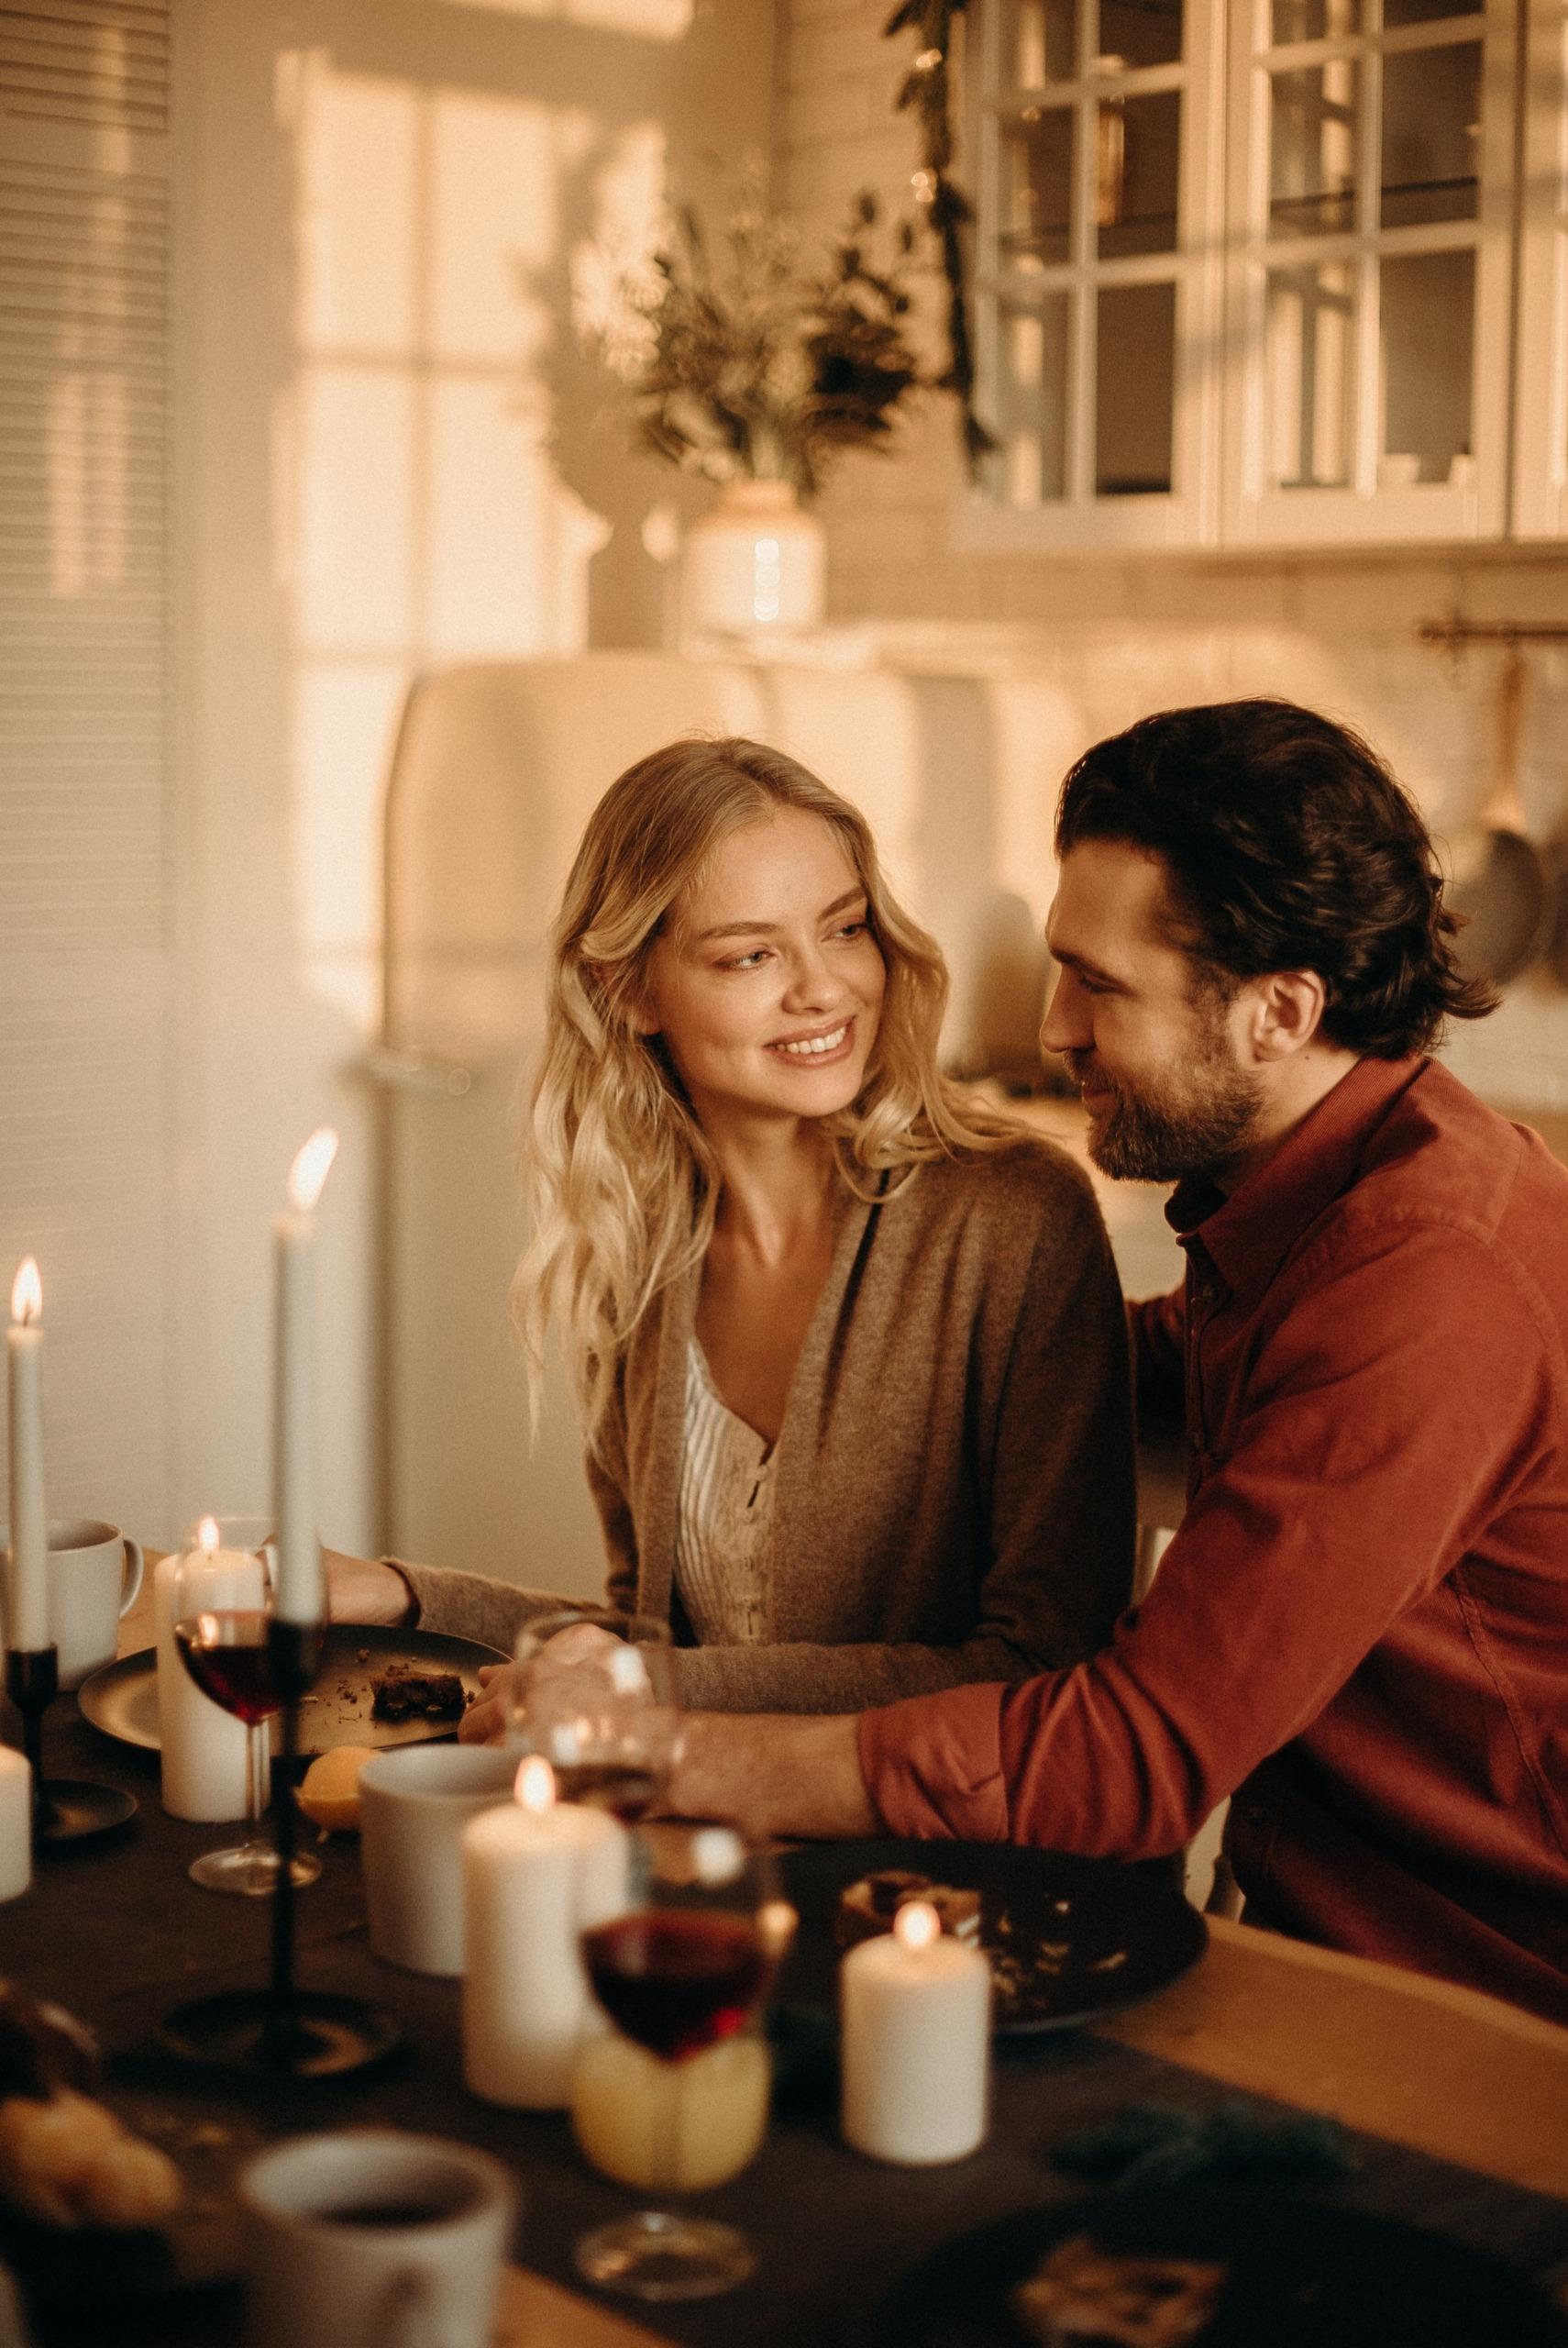 Candle-lit dinner romantic